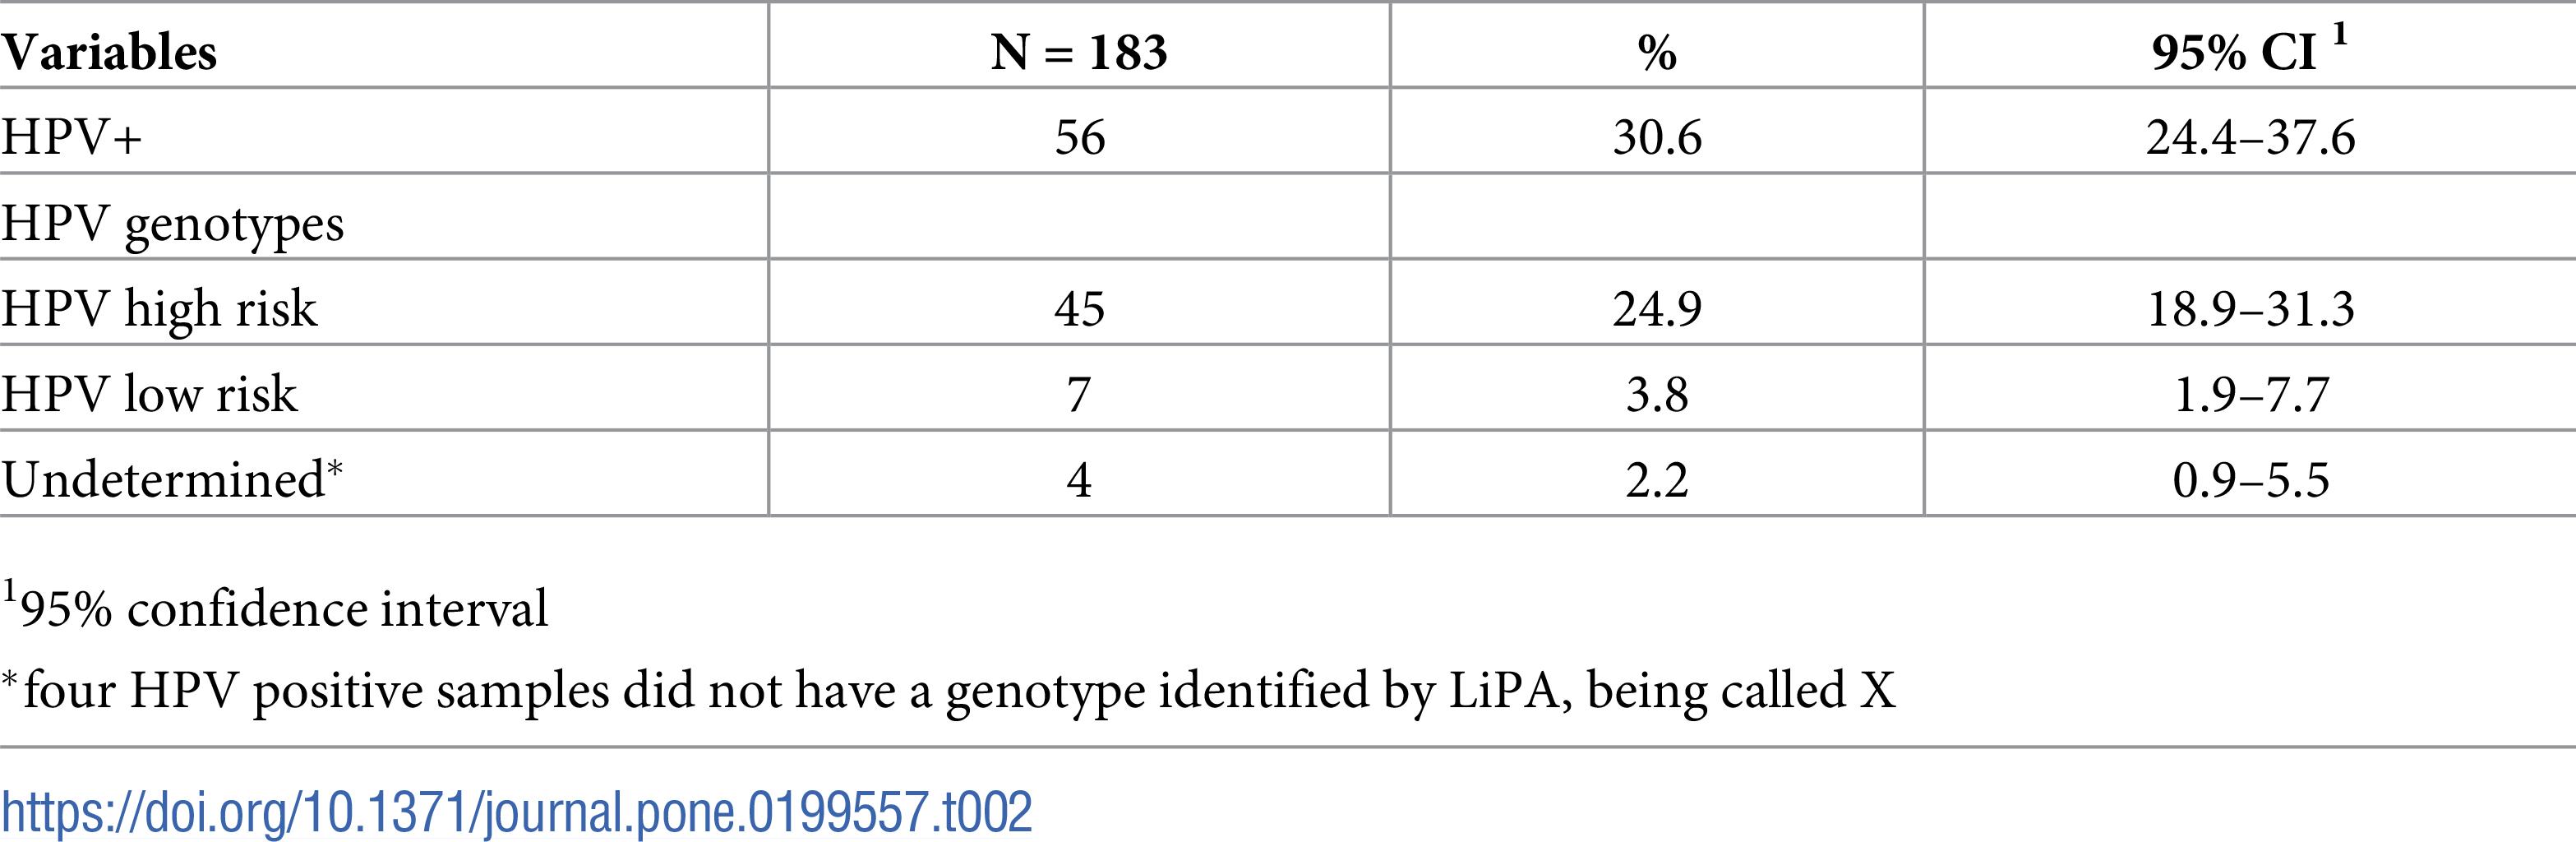 enterobius vermicularis u oxiuros tratamiento pastile uriașe pentru viermi